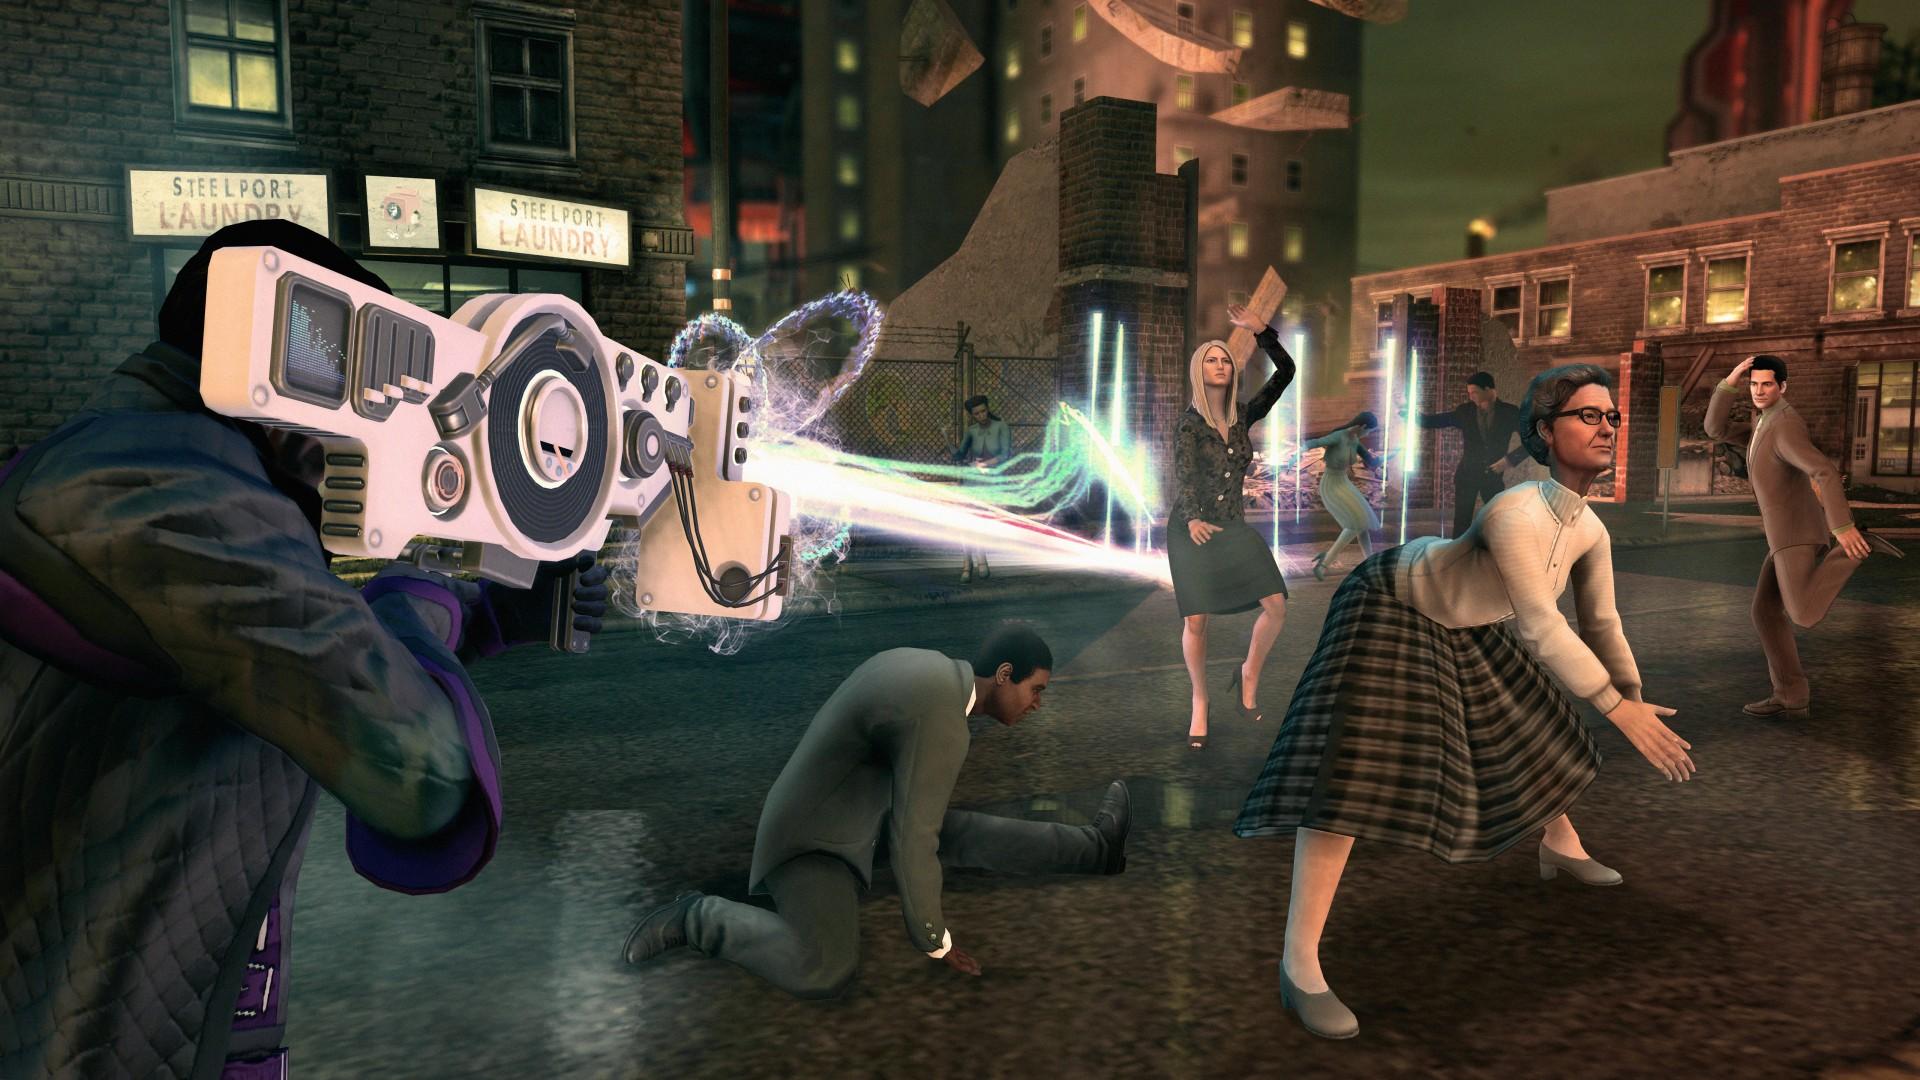 Destiny Dance Gif: Destiny 2: Shadowkeep Armor Customization System Explained